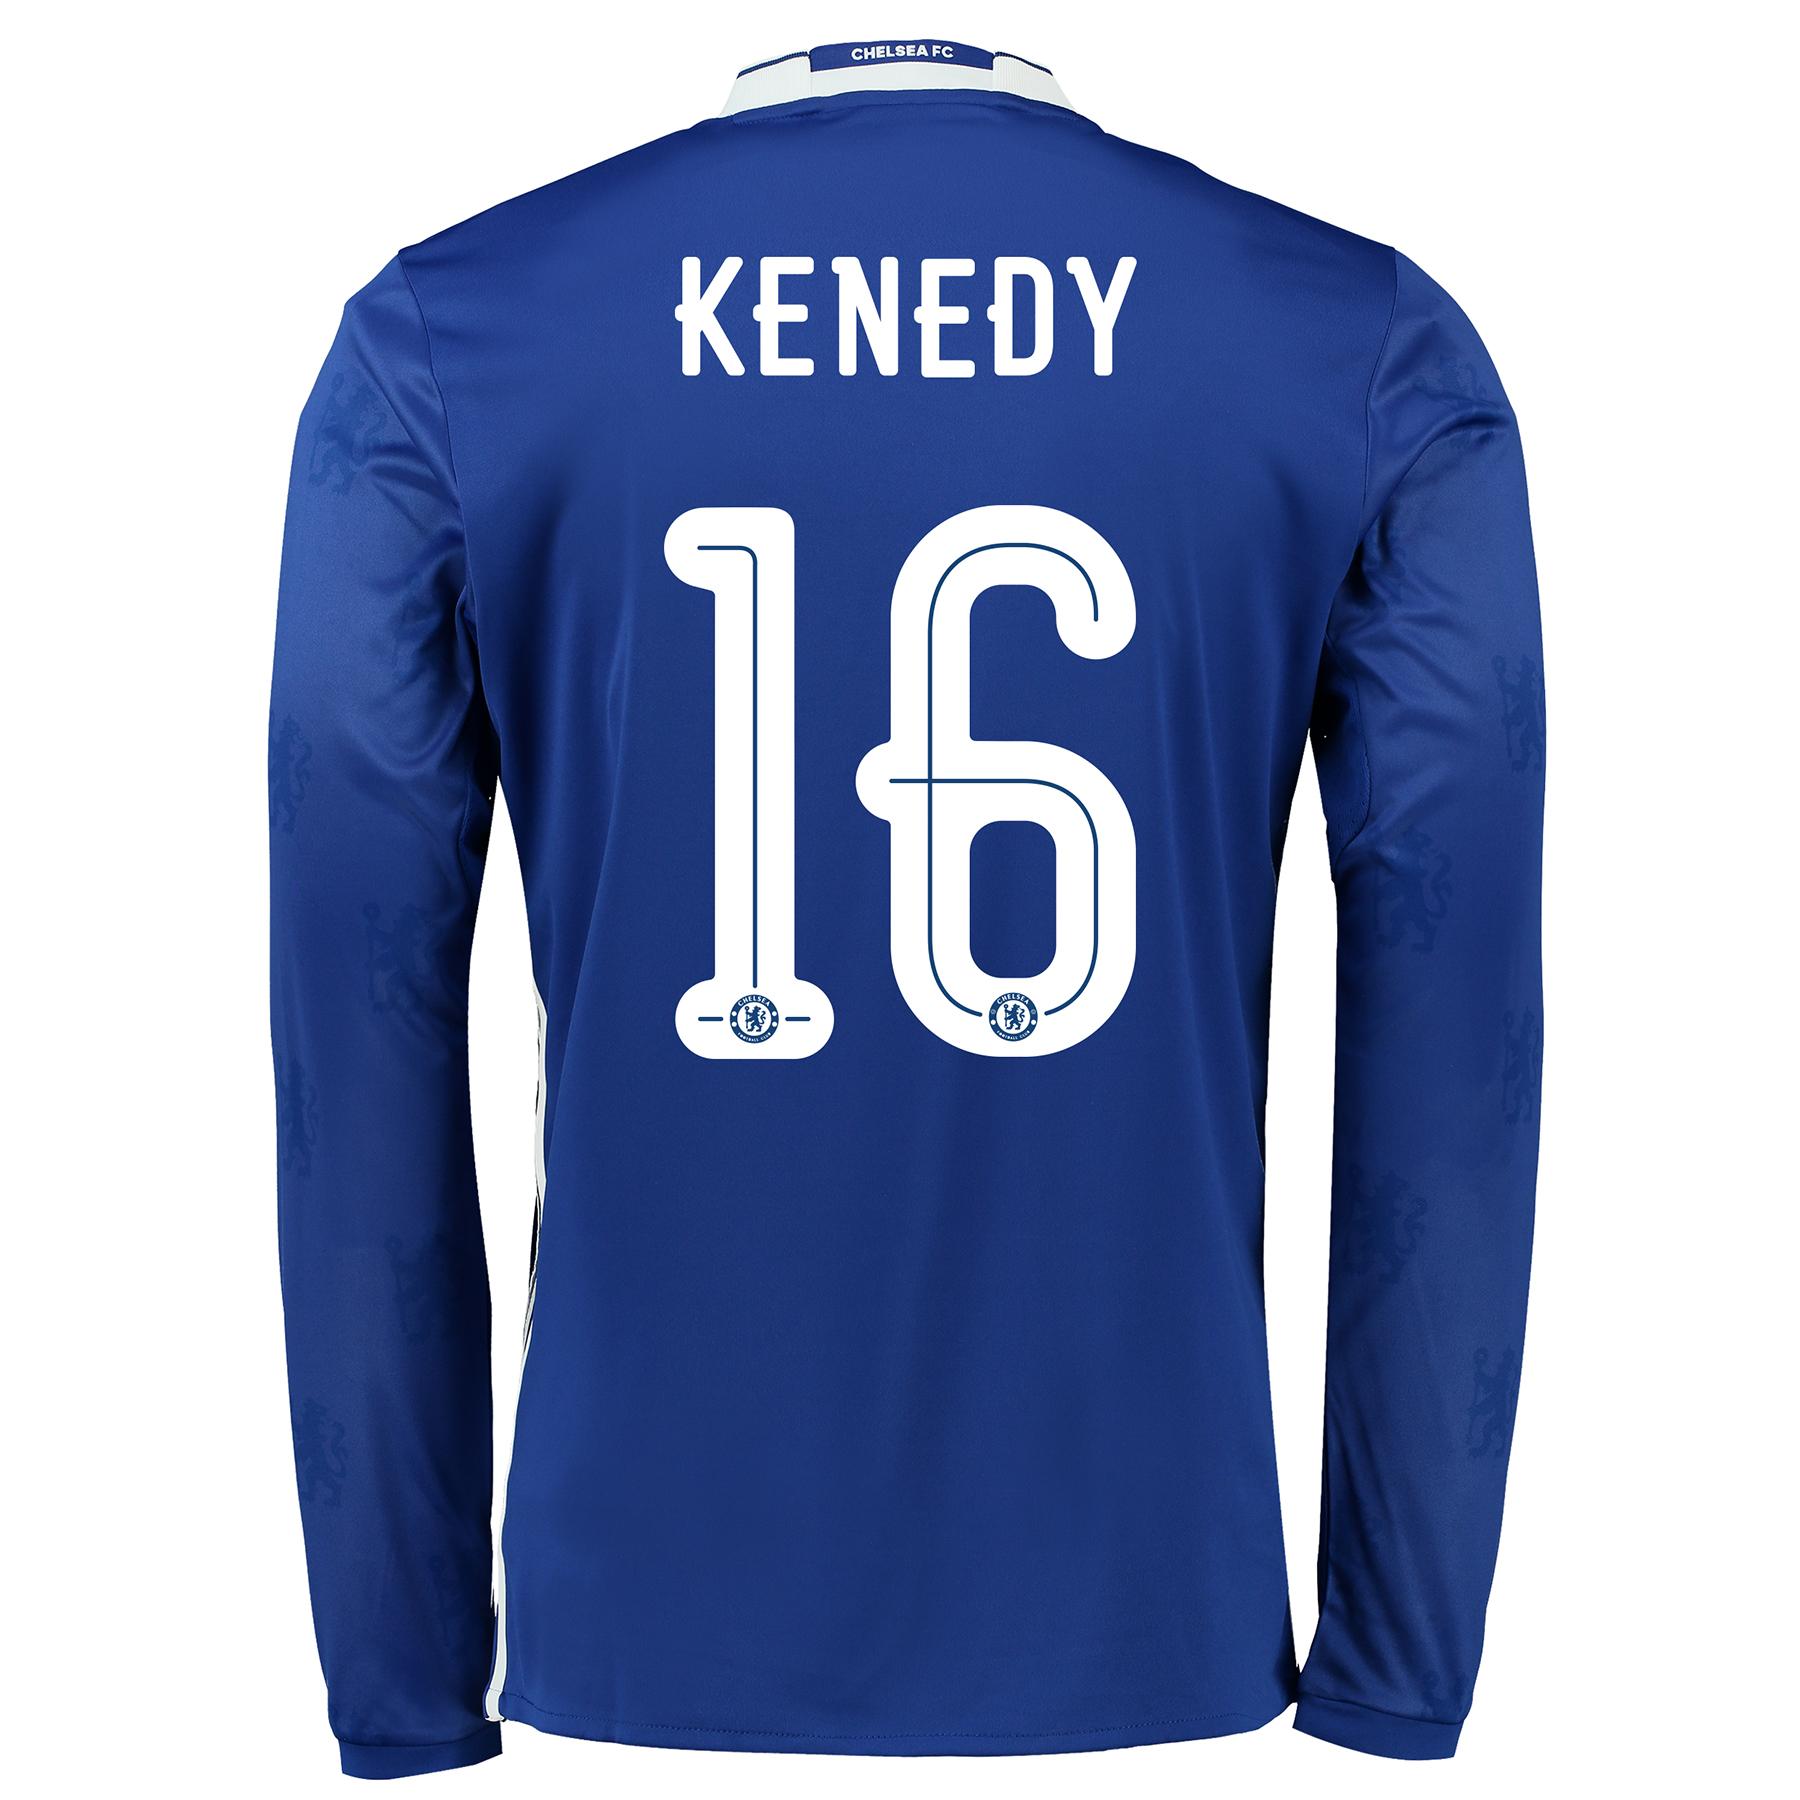 Chelsea Linear Home Shirt 2016-17 - Long Sleeve with Kenedy 16 printin